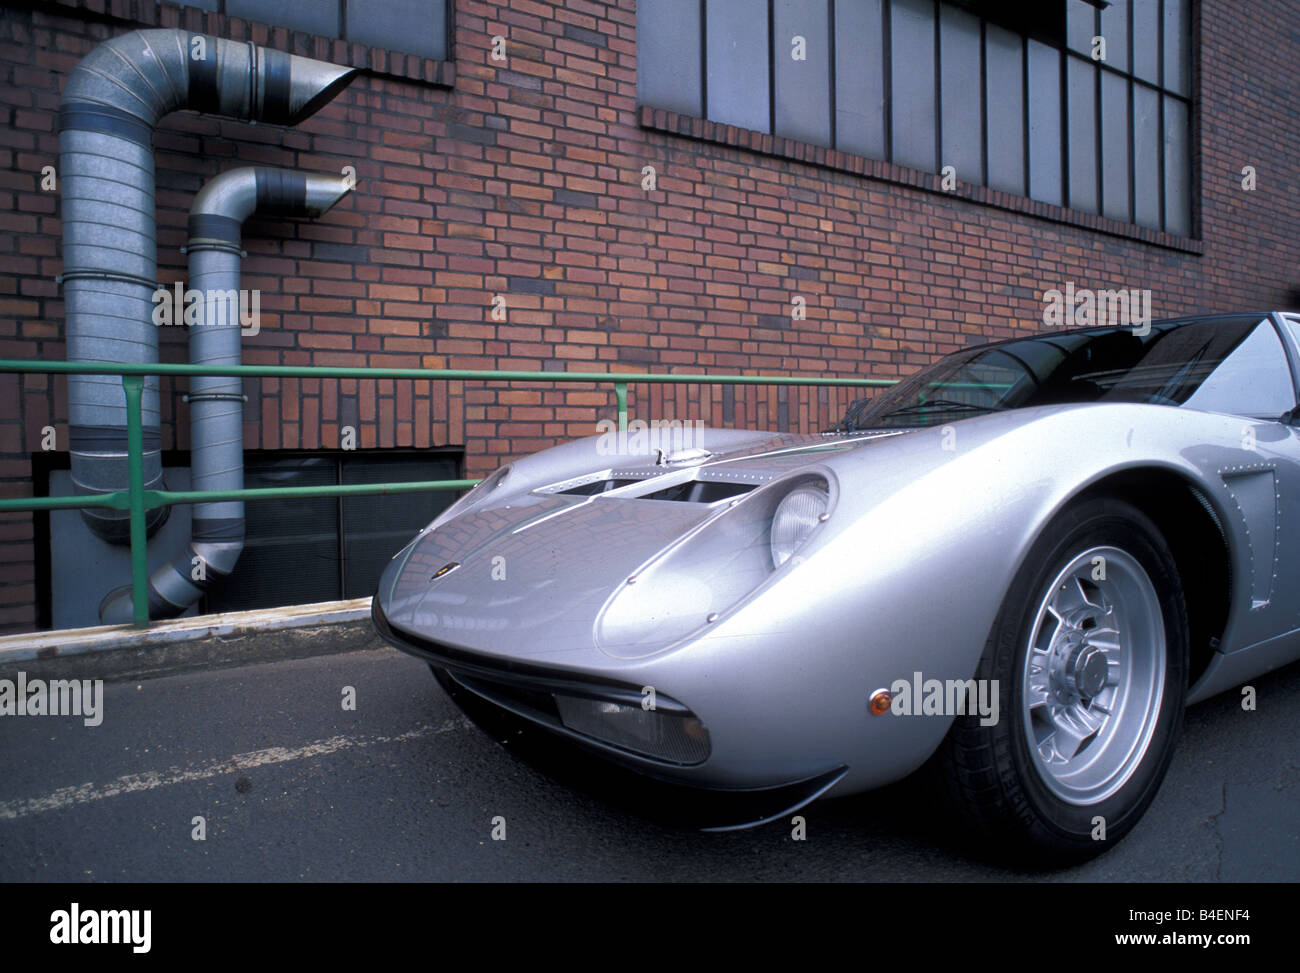 http://c8.alamy.com/comp/B4ENF4/car-lamborghini-miura-sv-jota-model-year-1970s-seventies-silver-sports-B4ENF4.jpg